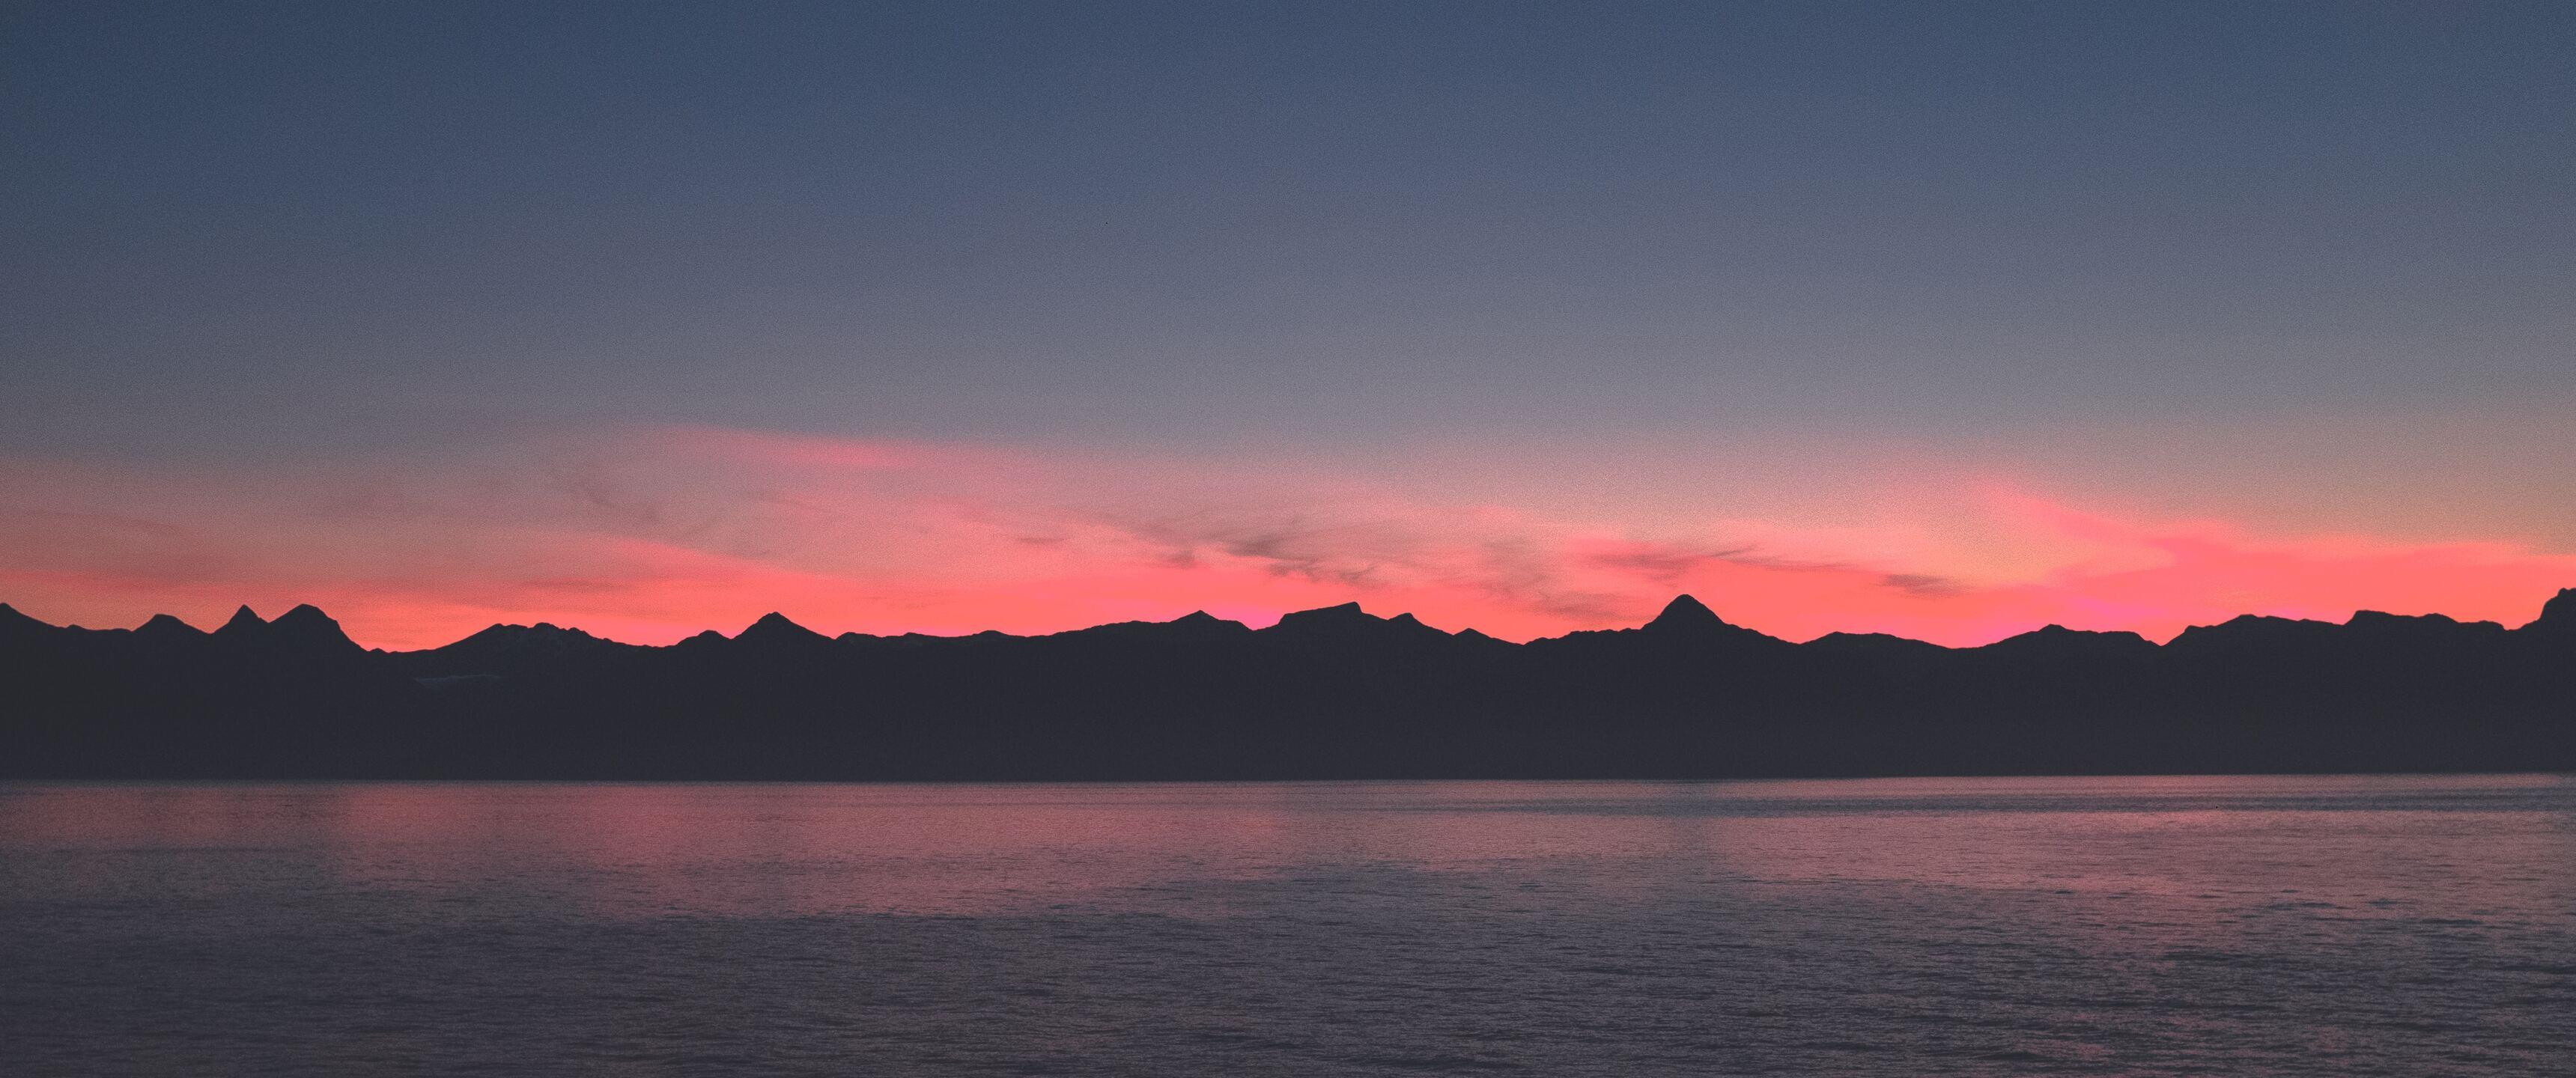 3440x1440 Warm Summer Sunset 5k